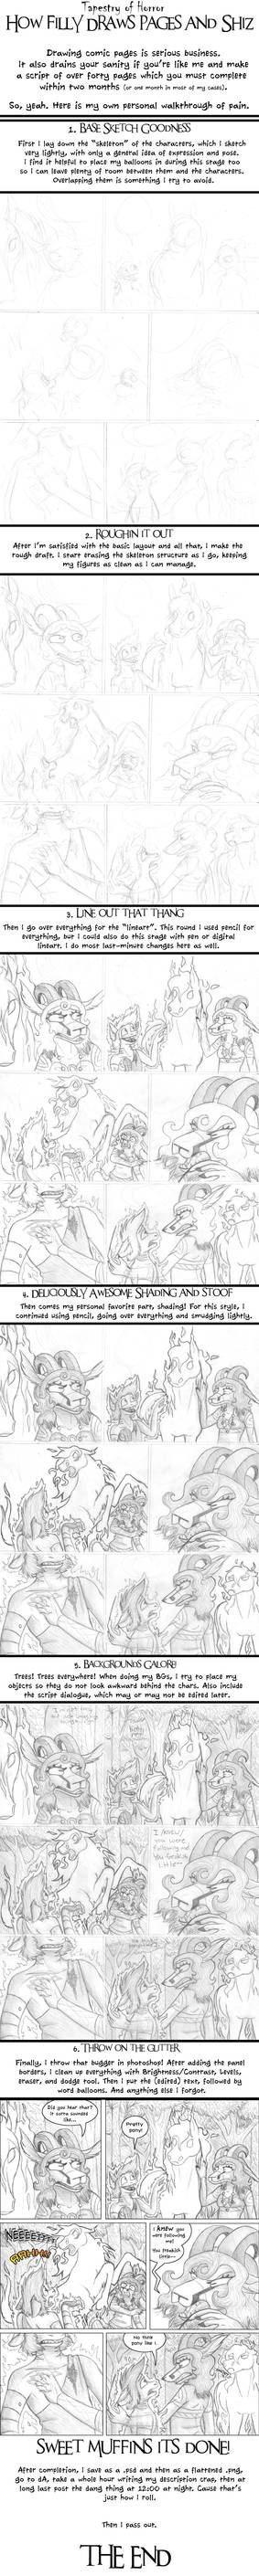 ToH: Comic Process of Doom